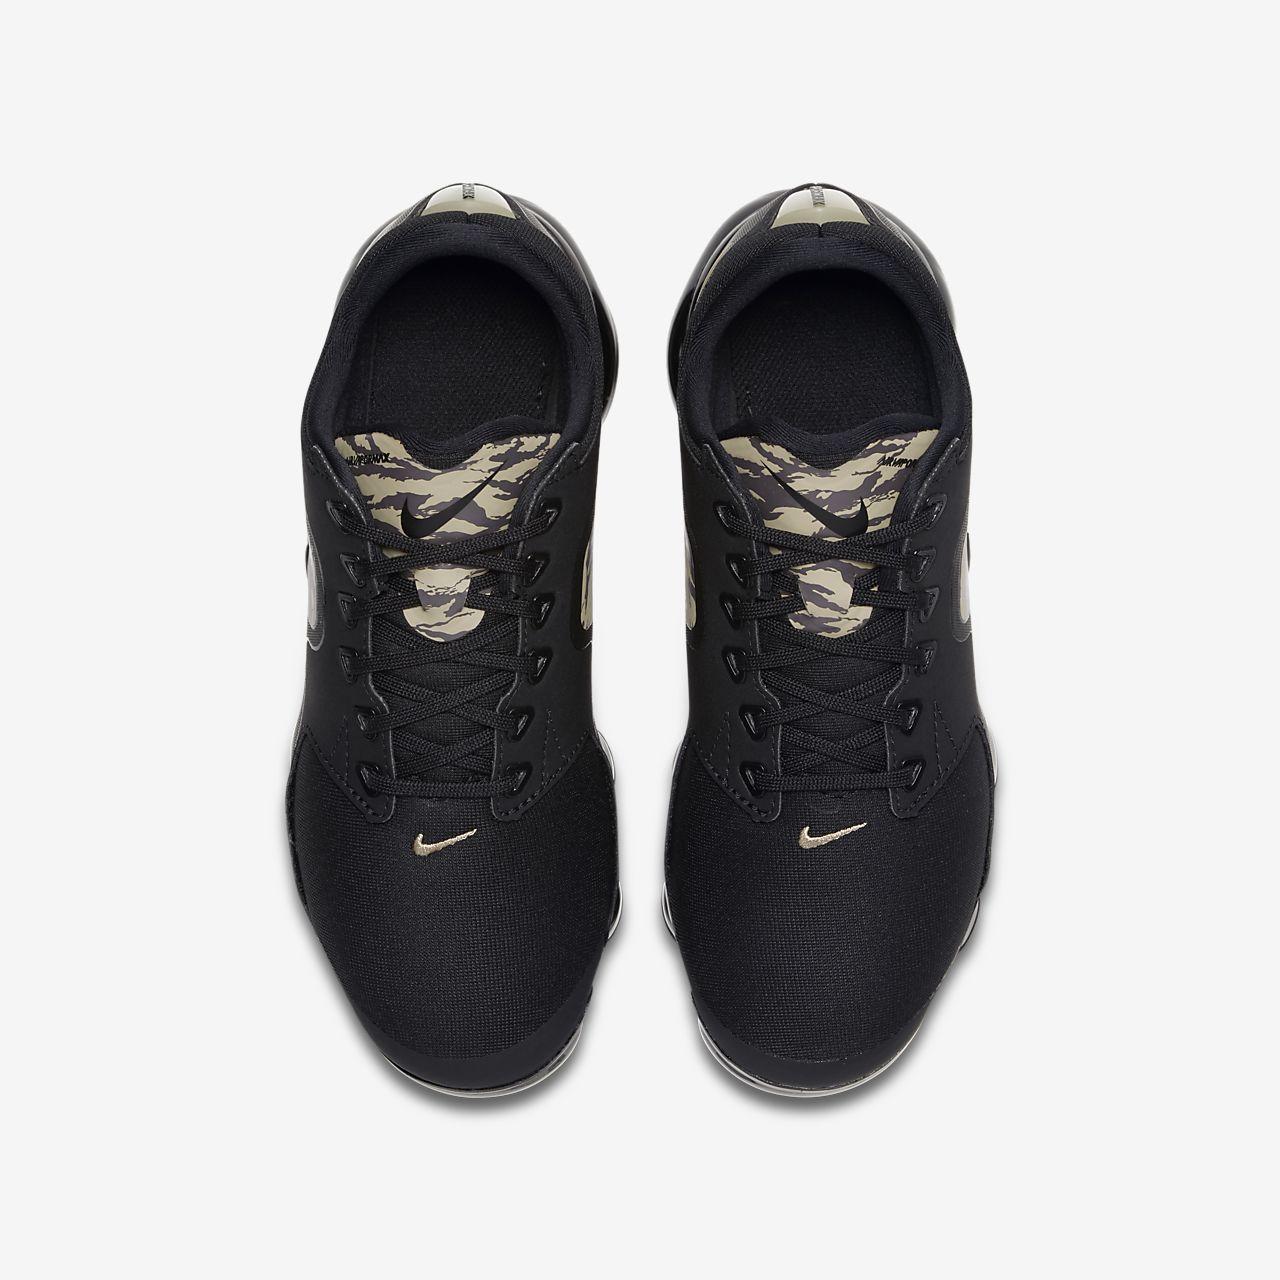 Nike Air Vapormax Infantil